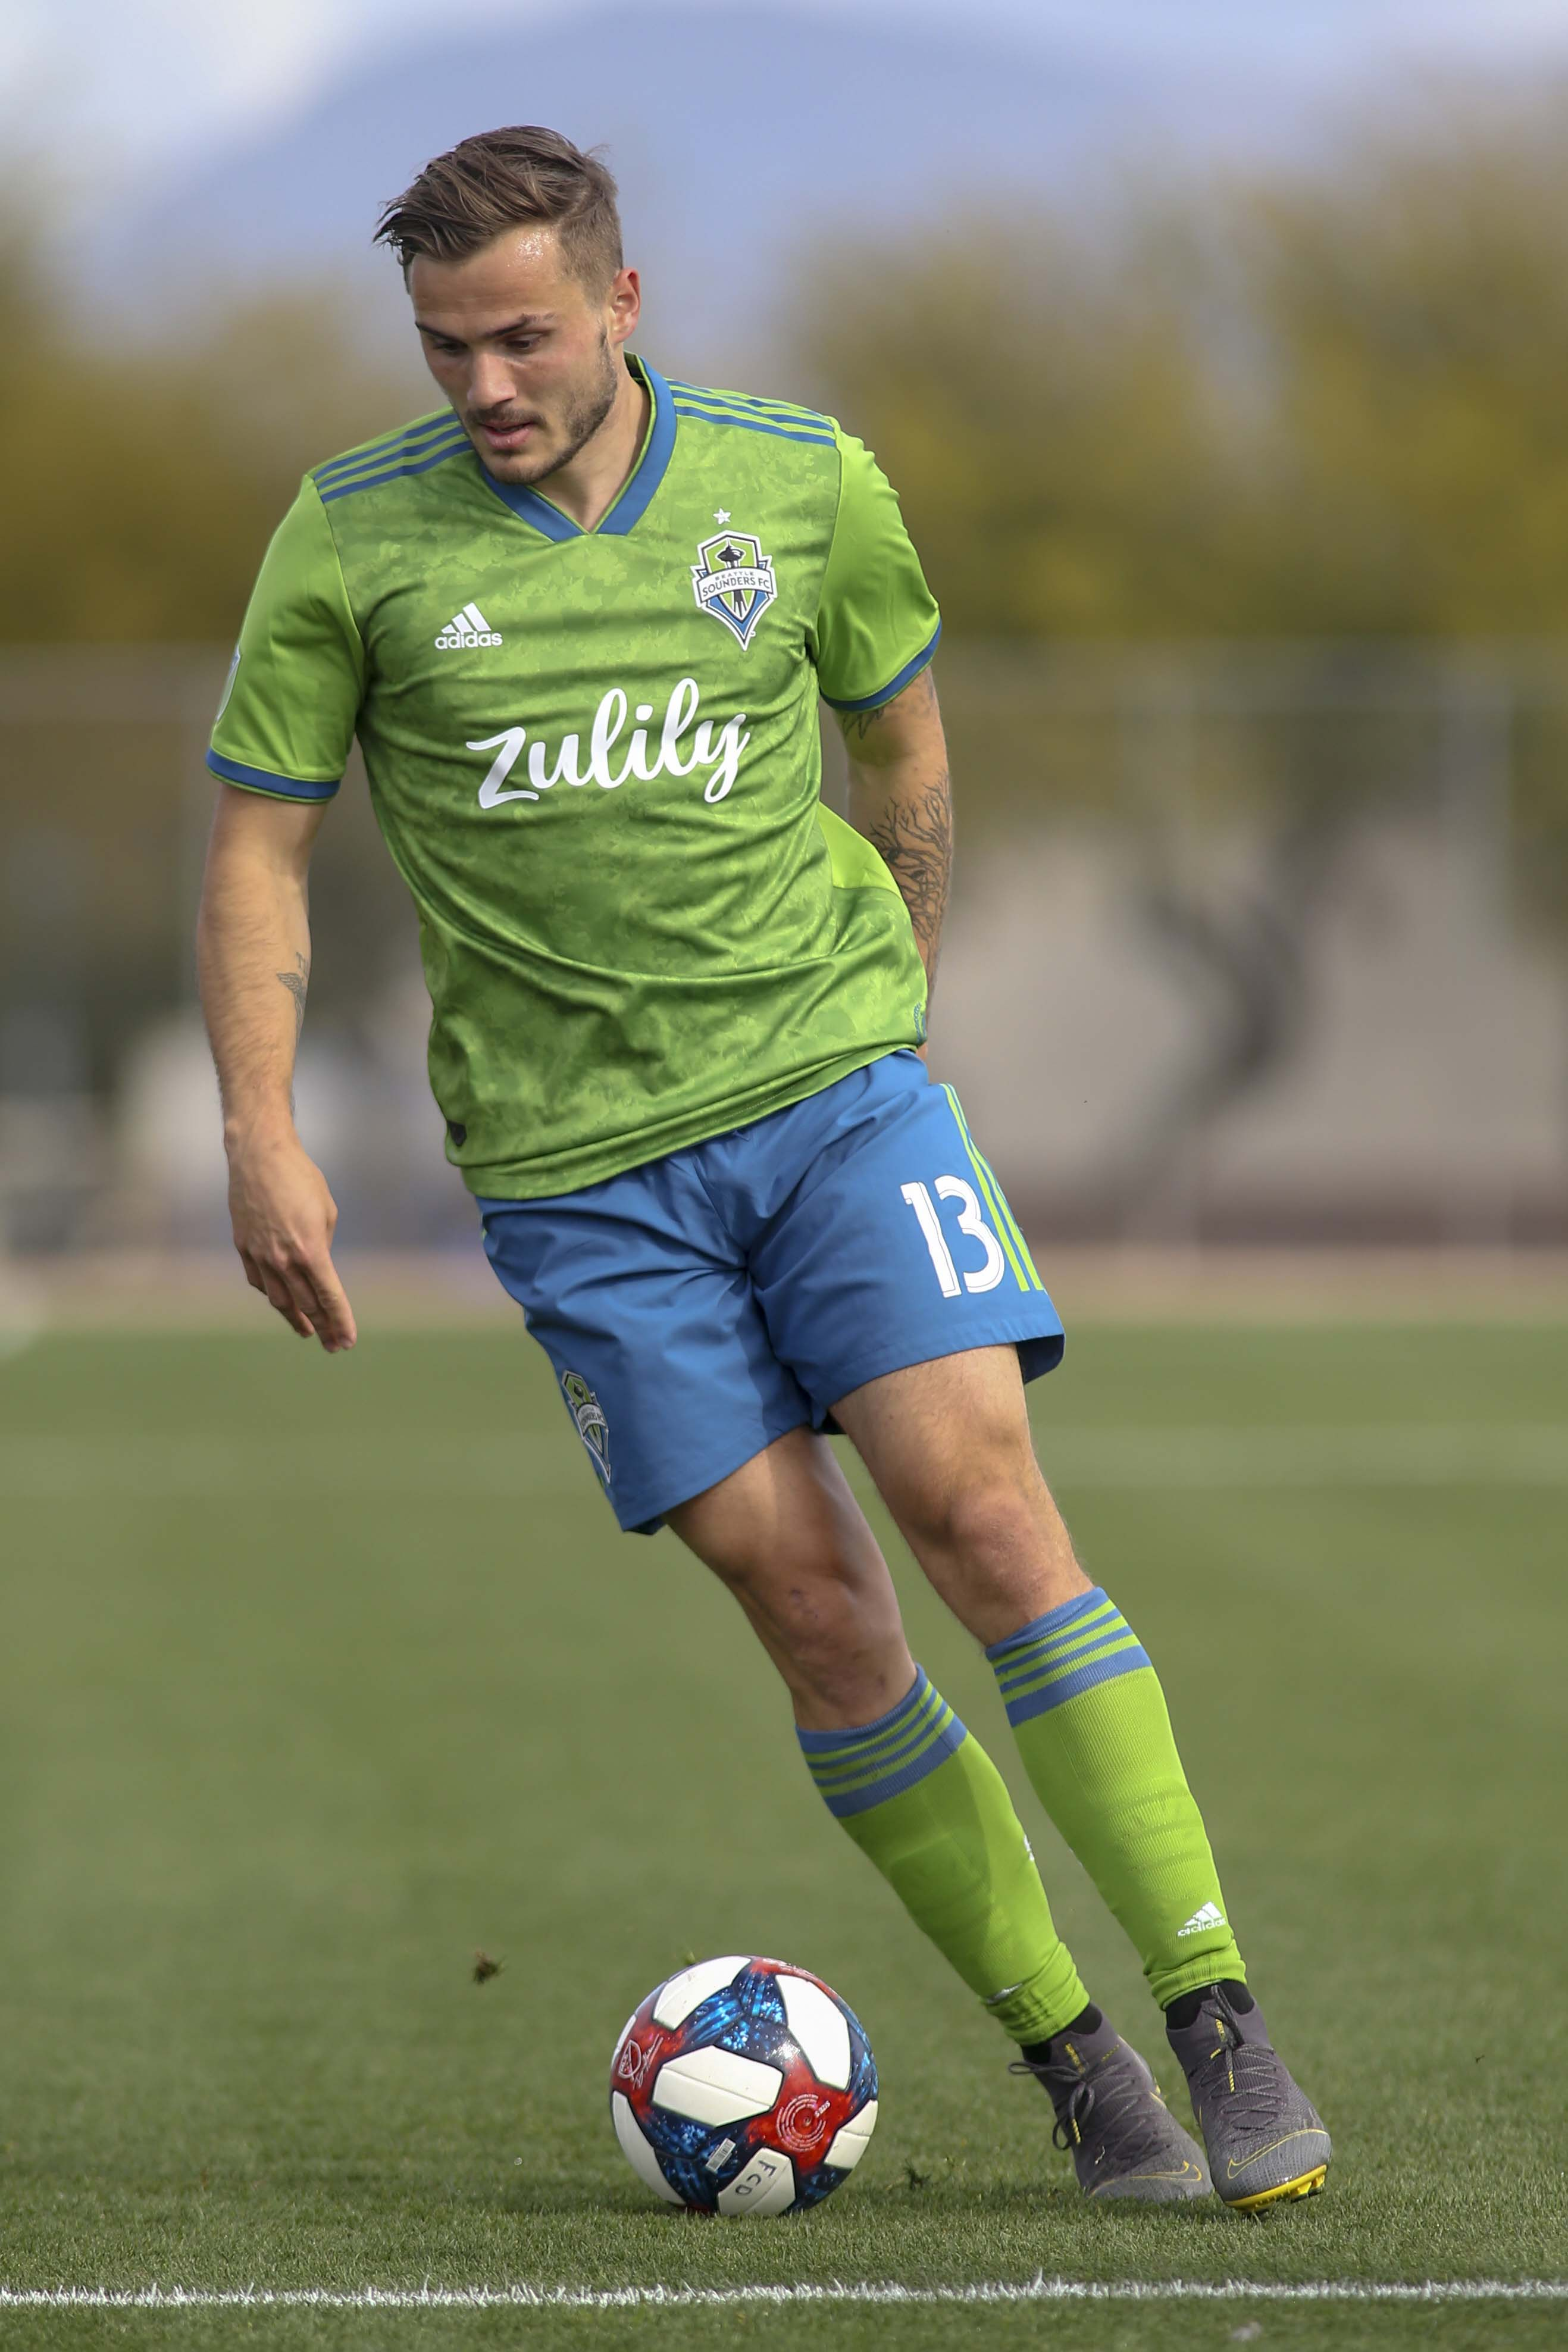 MLS: Mobile Mini Sun Cup-FC Dallas at Seattle Sounders